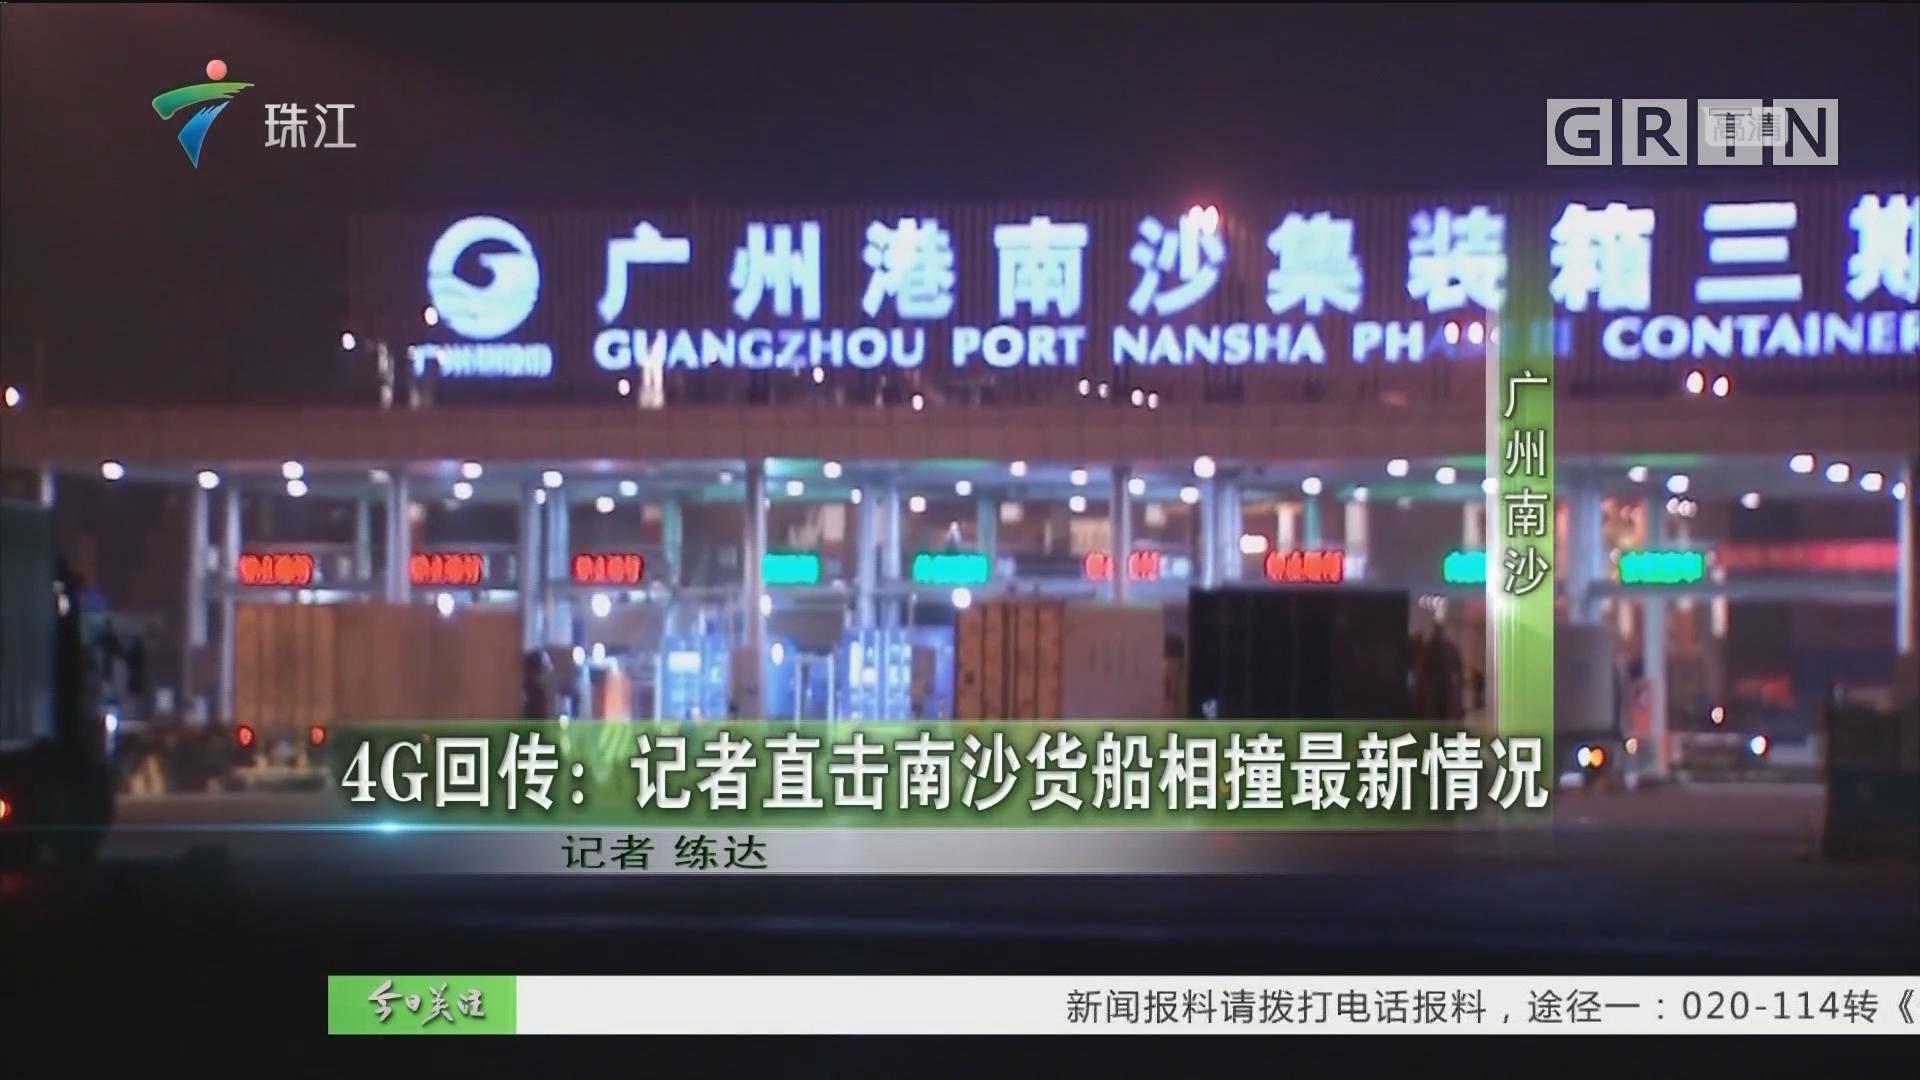 4G回传:记者直击南沙货船相撞最新情况